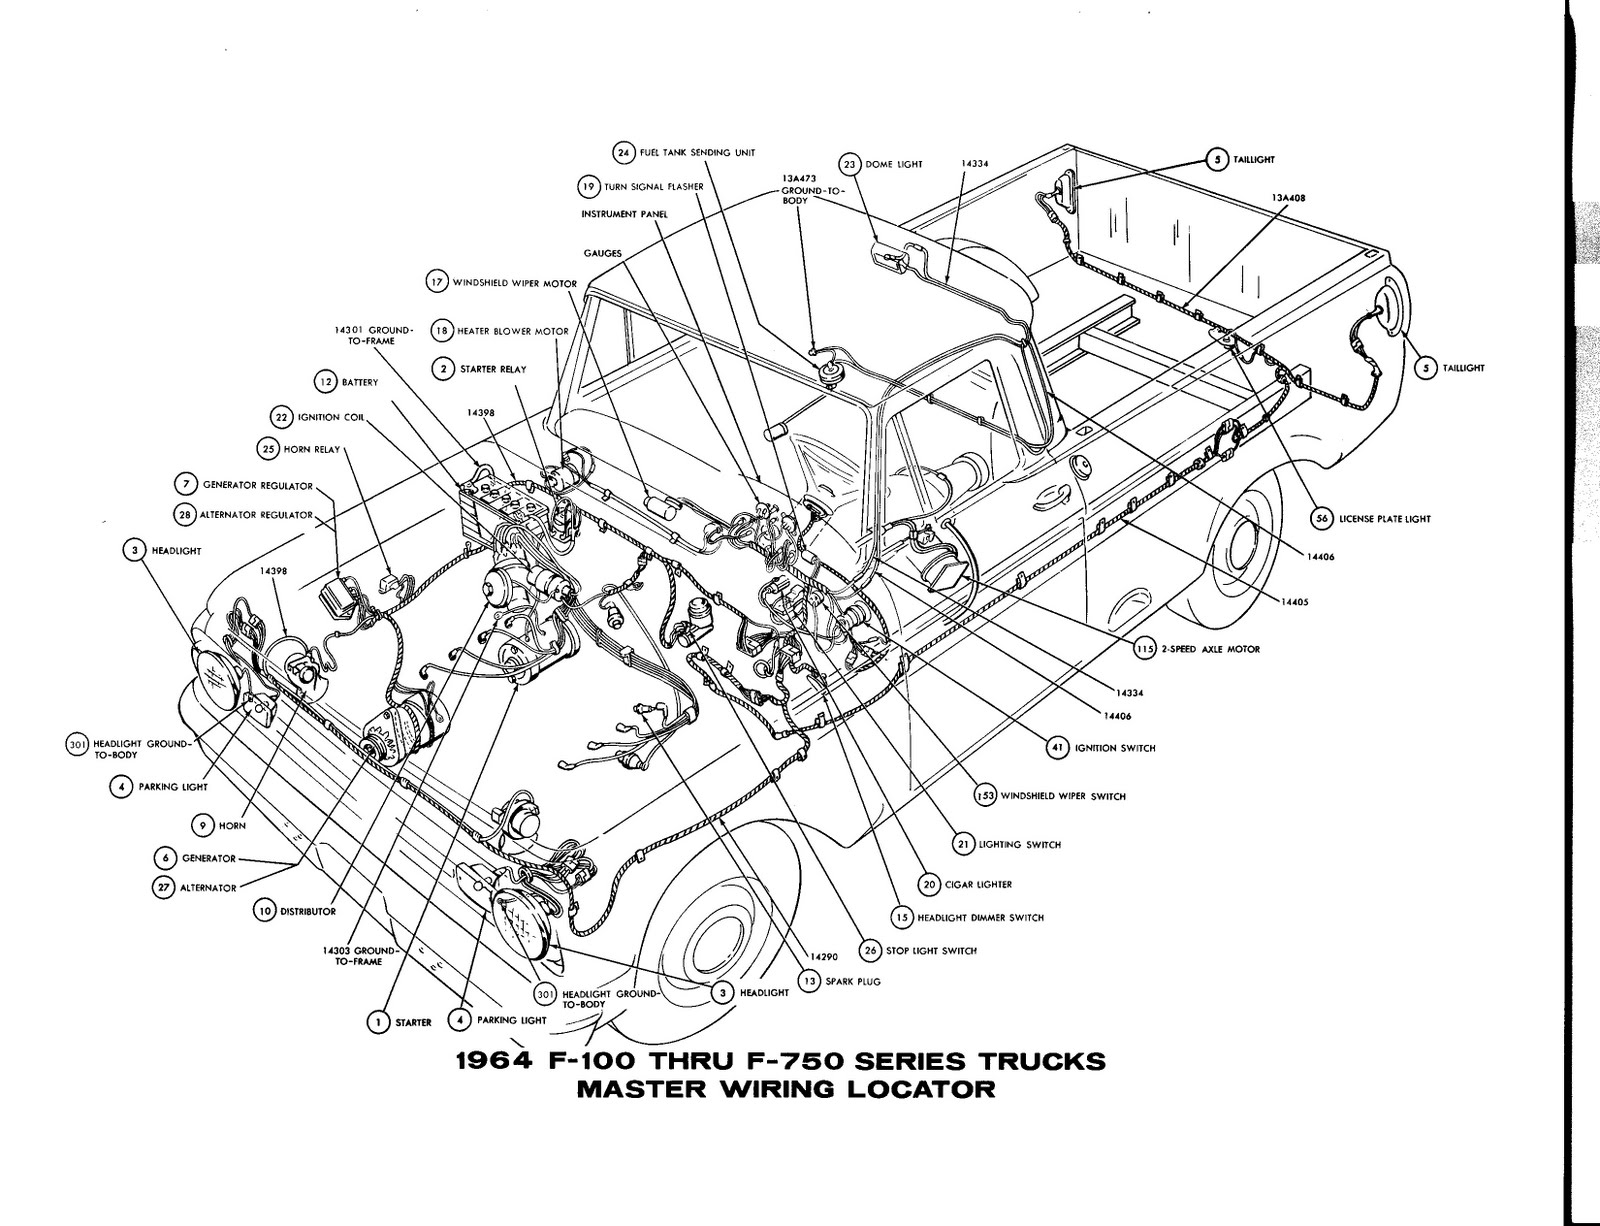 small resolution of 1964 ford f 100 thru f 750 truck master wiring